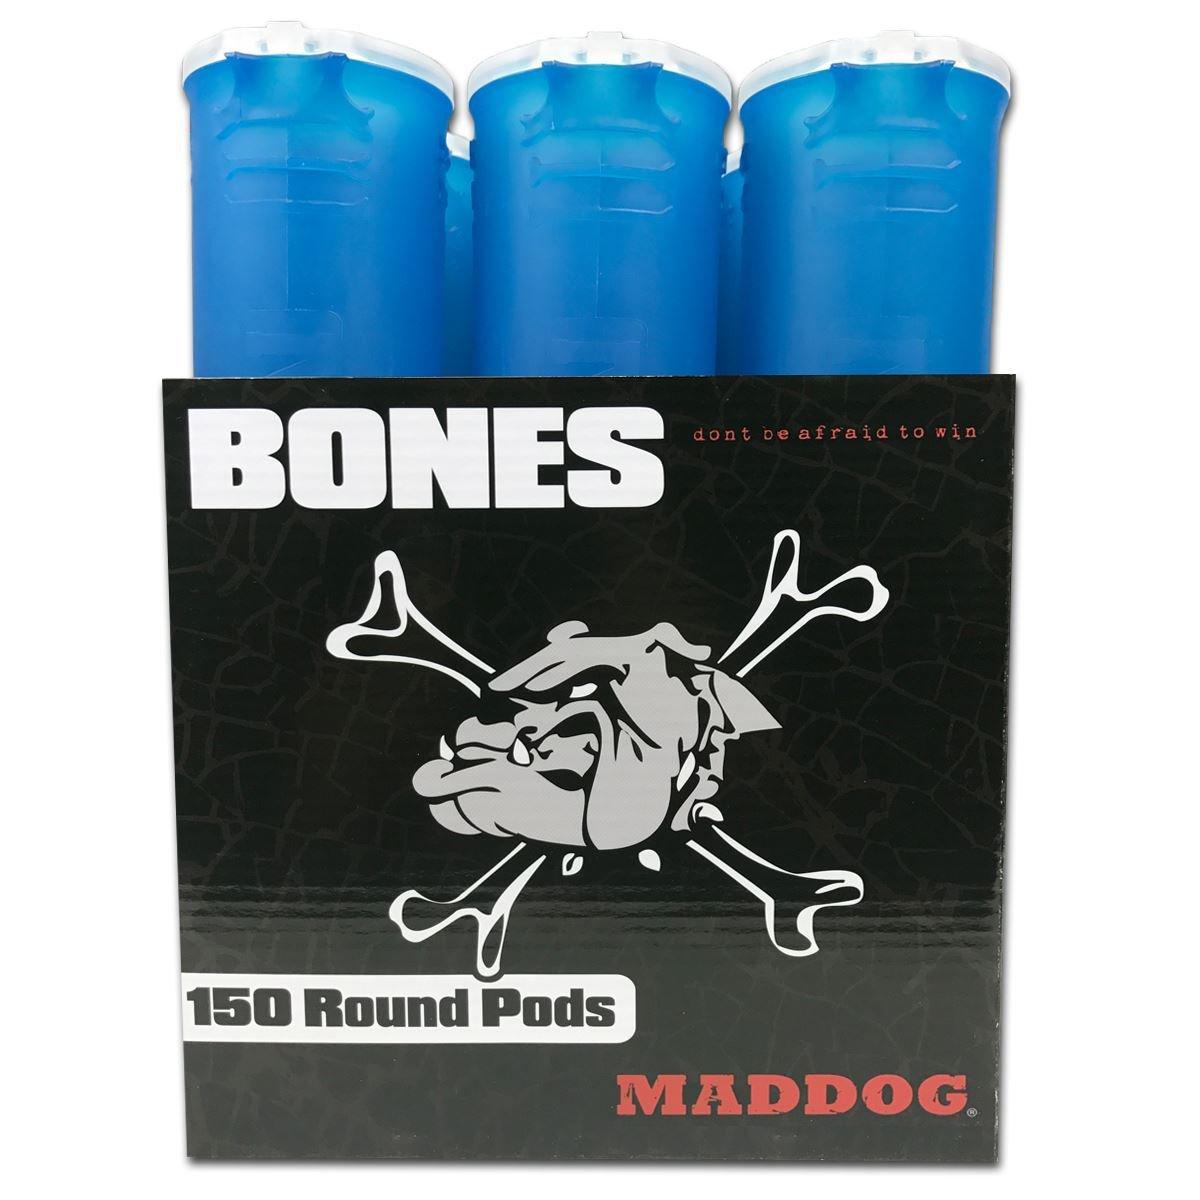 MAddog 150 Round Bones Paintball Pods - Aqua - 6 Pack by MAddog